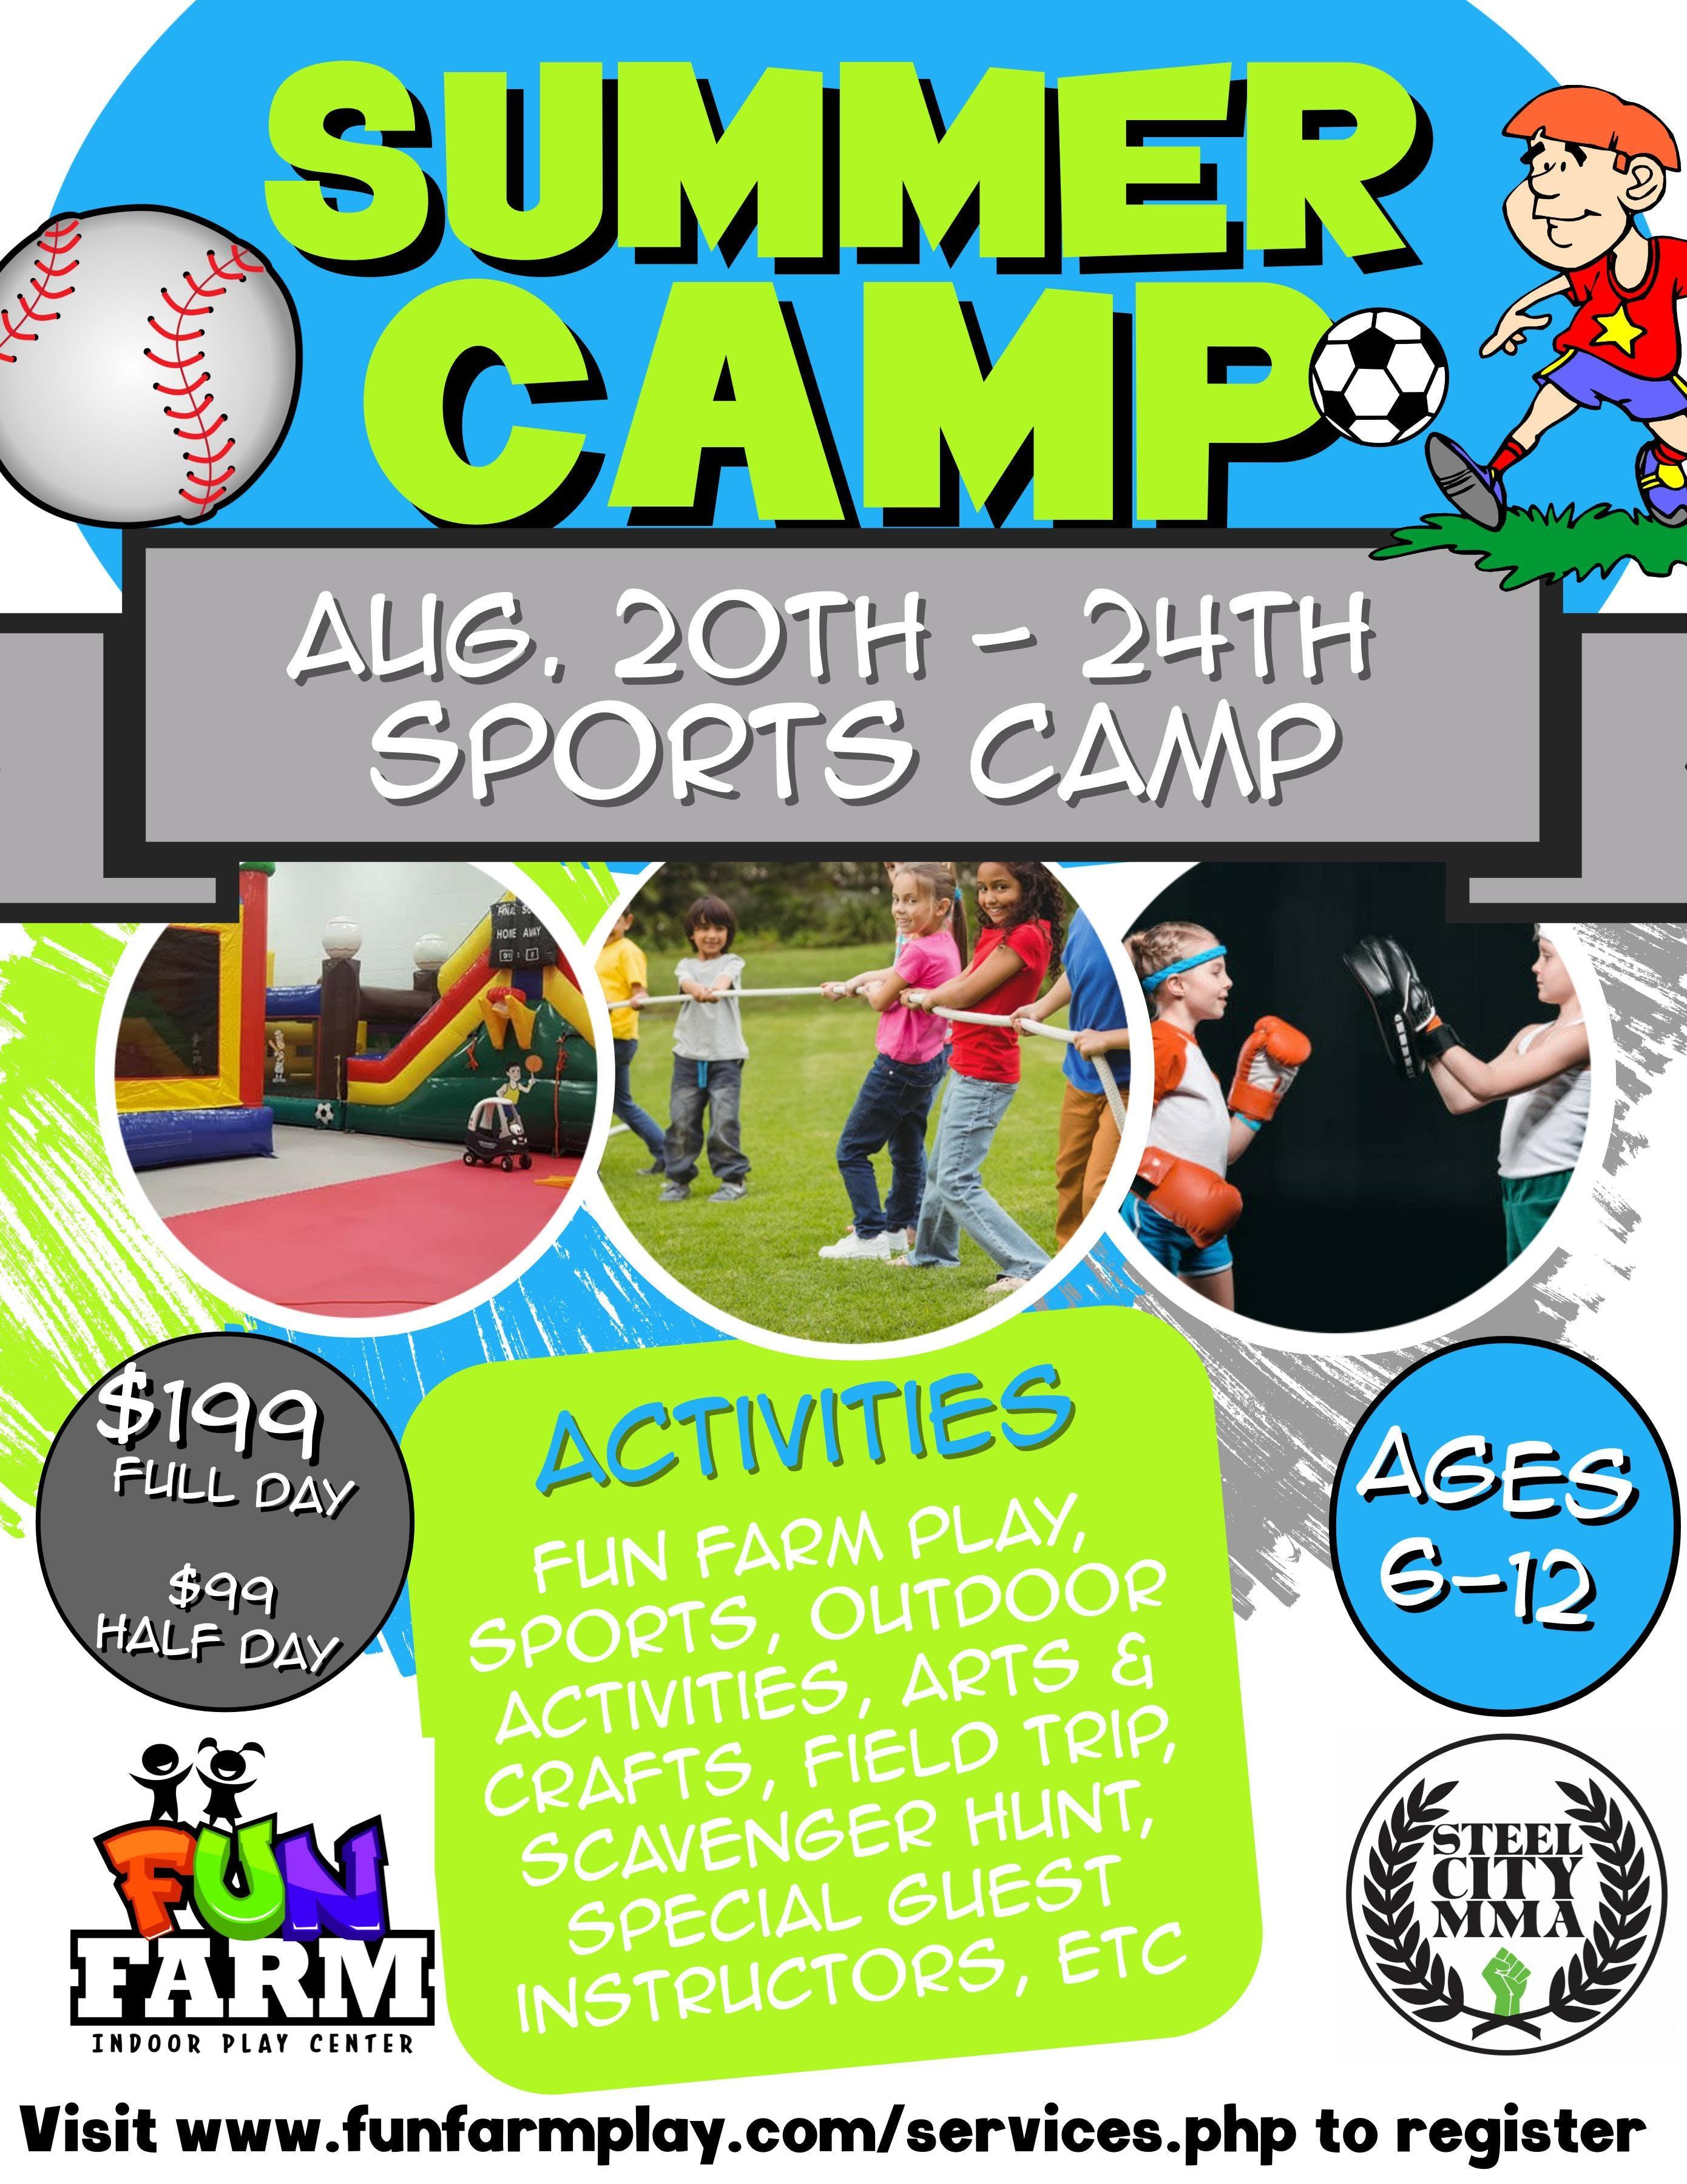 Summer Camp, Aug 20th - 24th - Sports Week